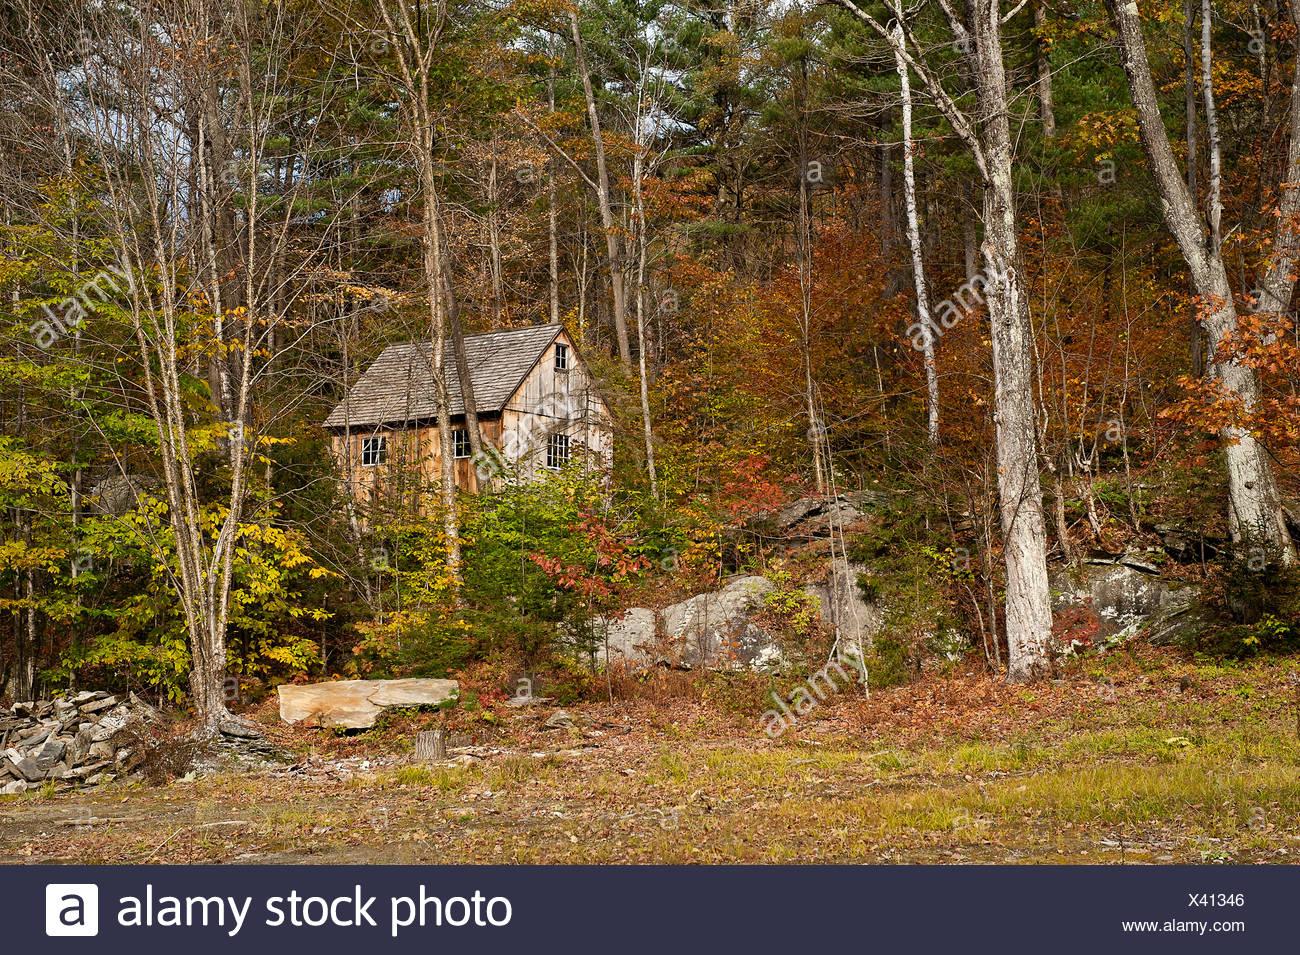 Remote mountain cabin, Vermont, USA - Stock Image